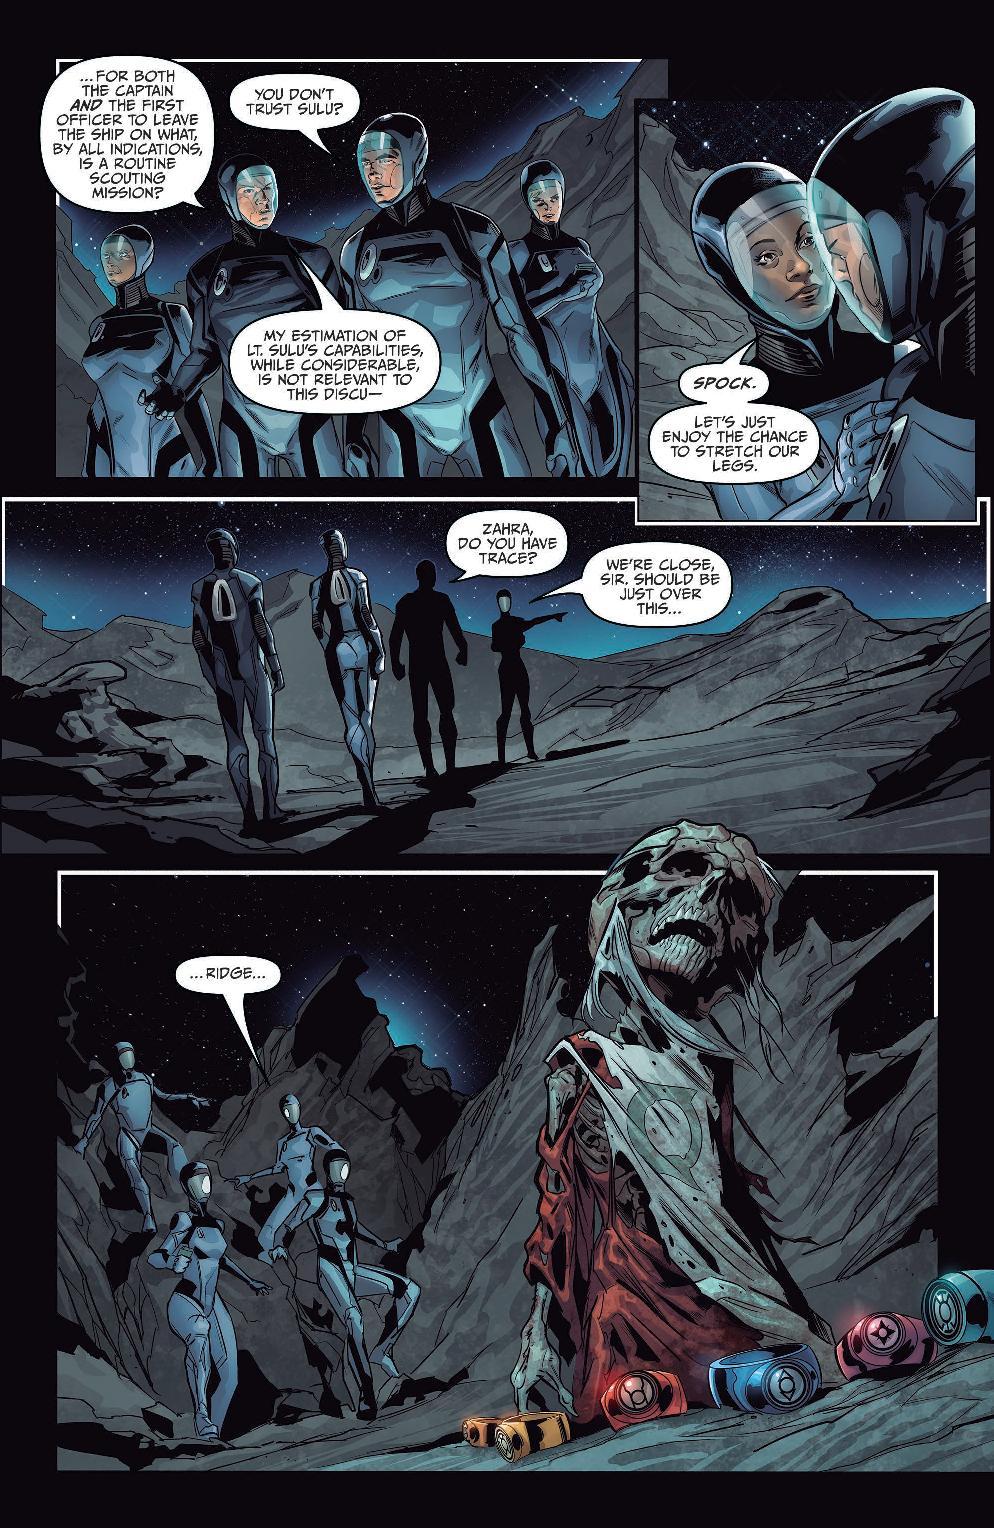 Star Trek/Green Lantern: The Spectrum War Preview Page